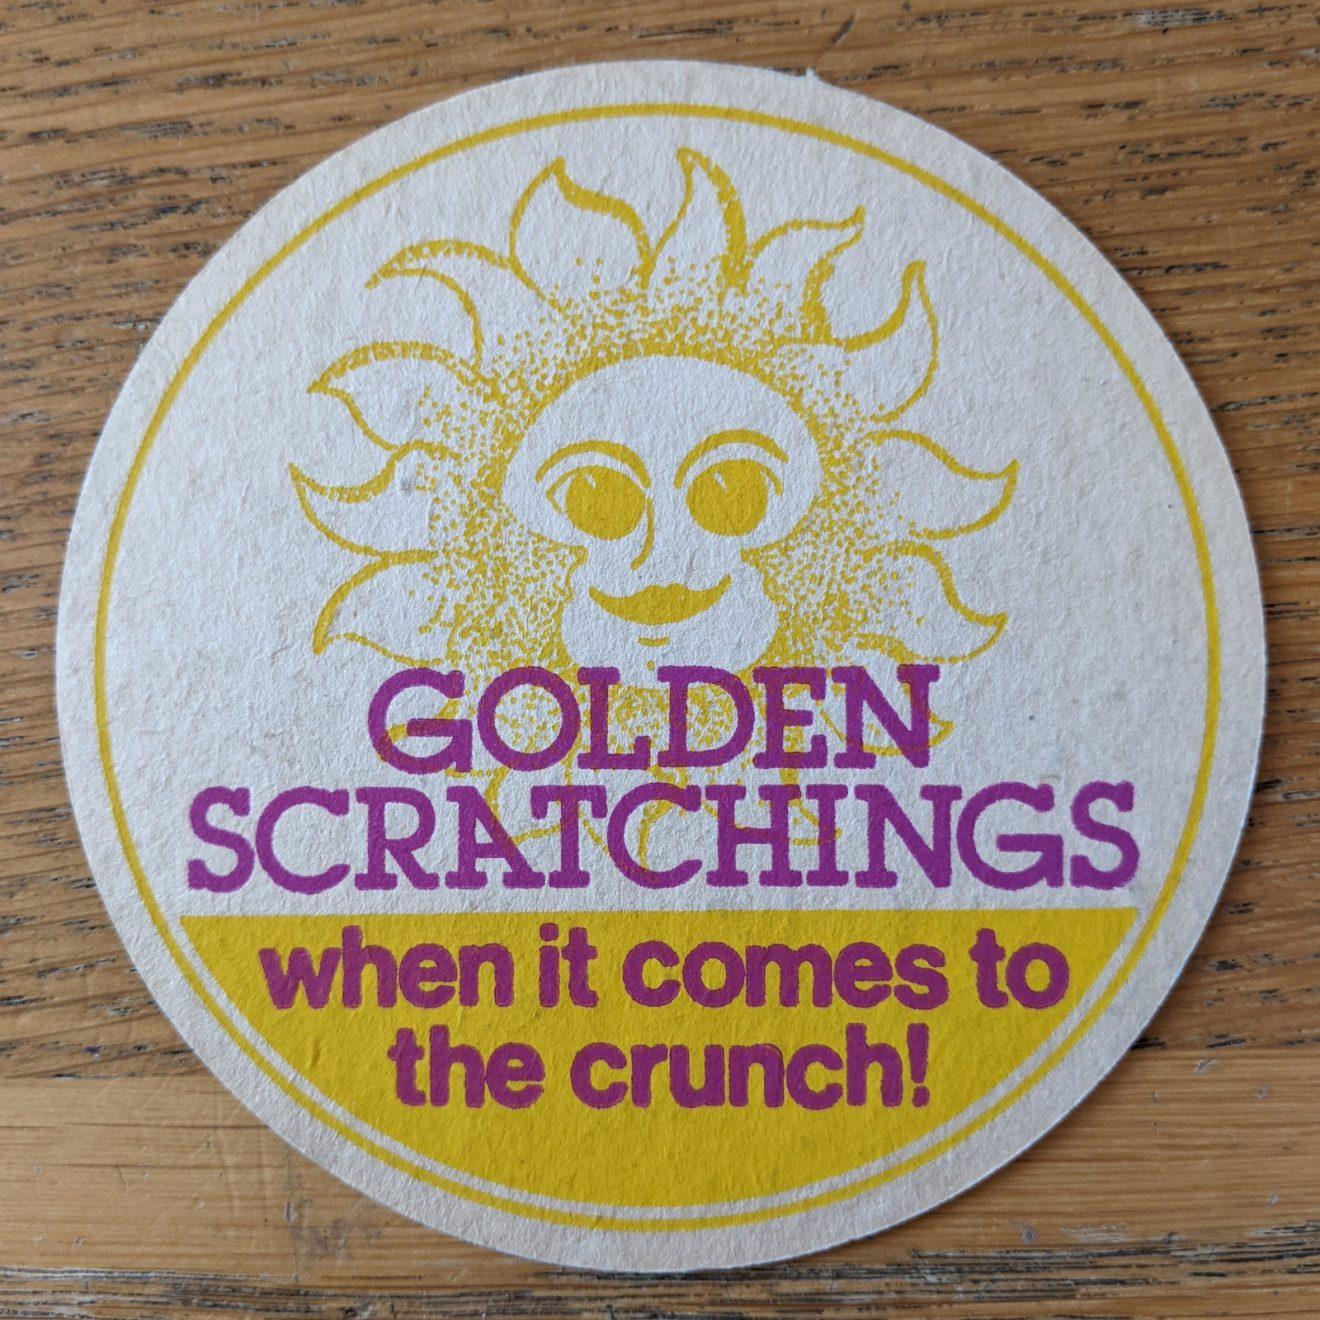 Vintage 'Golden Scratchings' Pork Scratchings Beer Mat